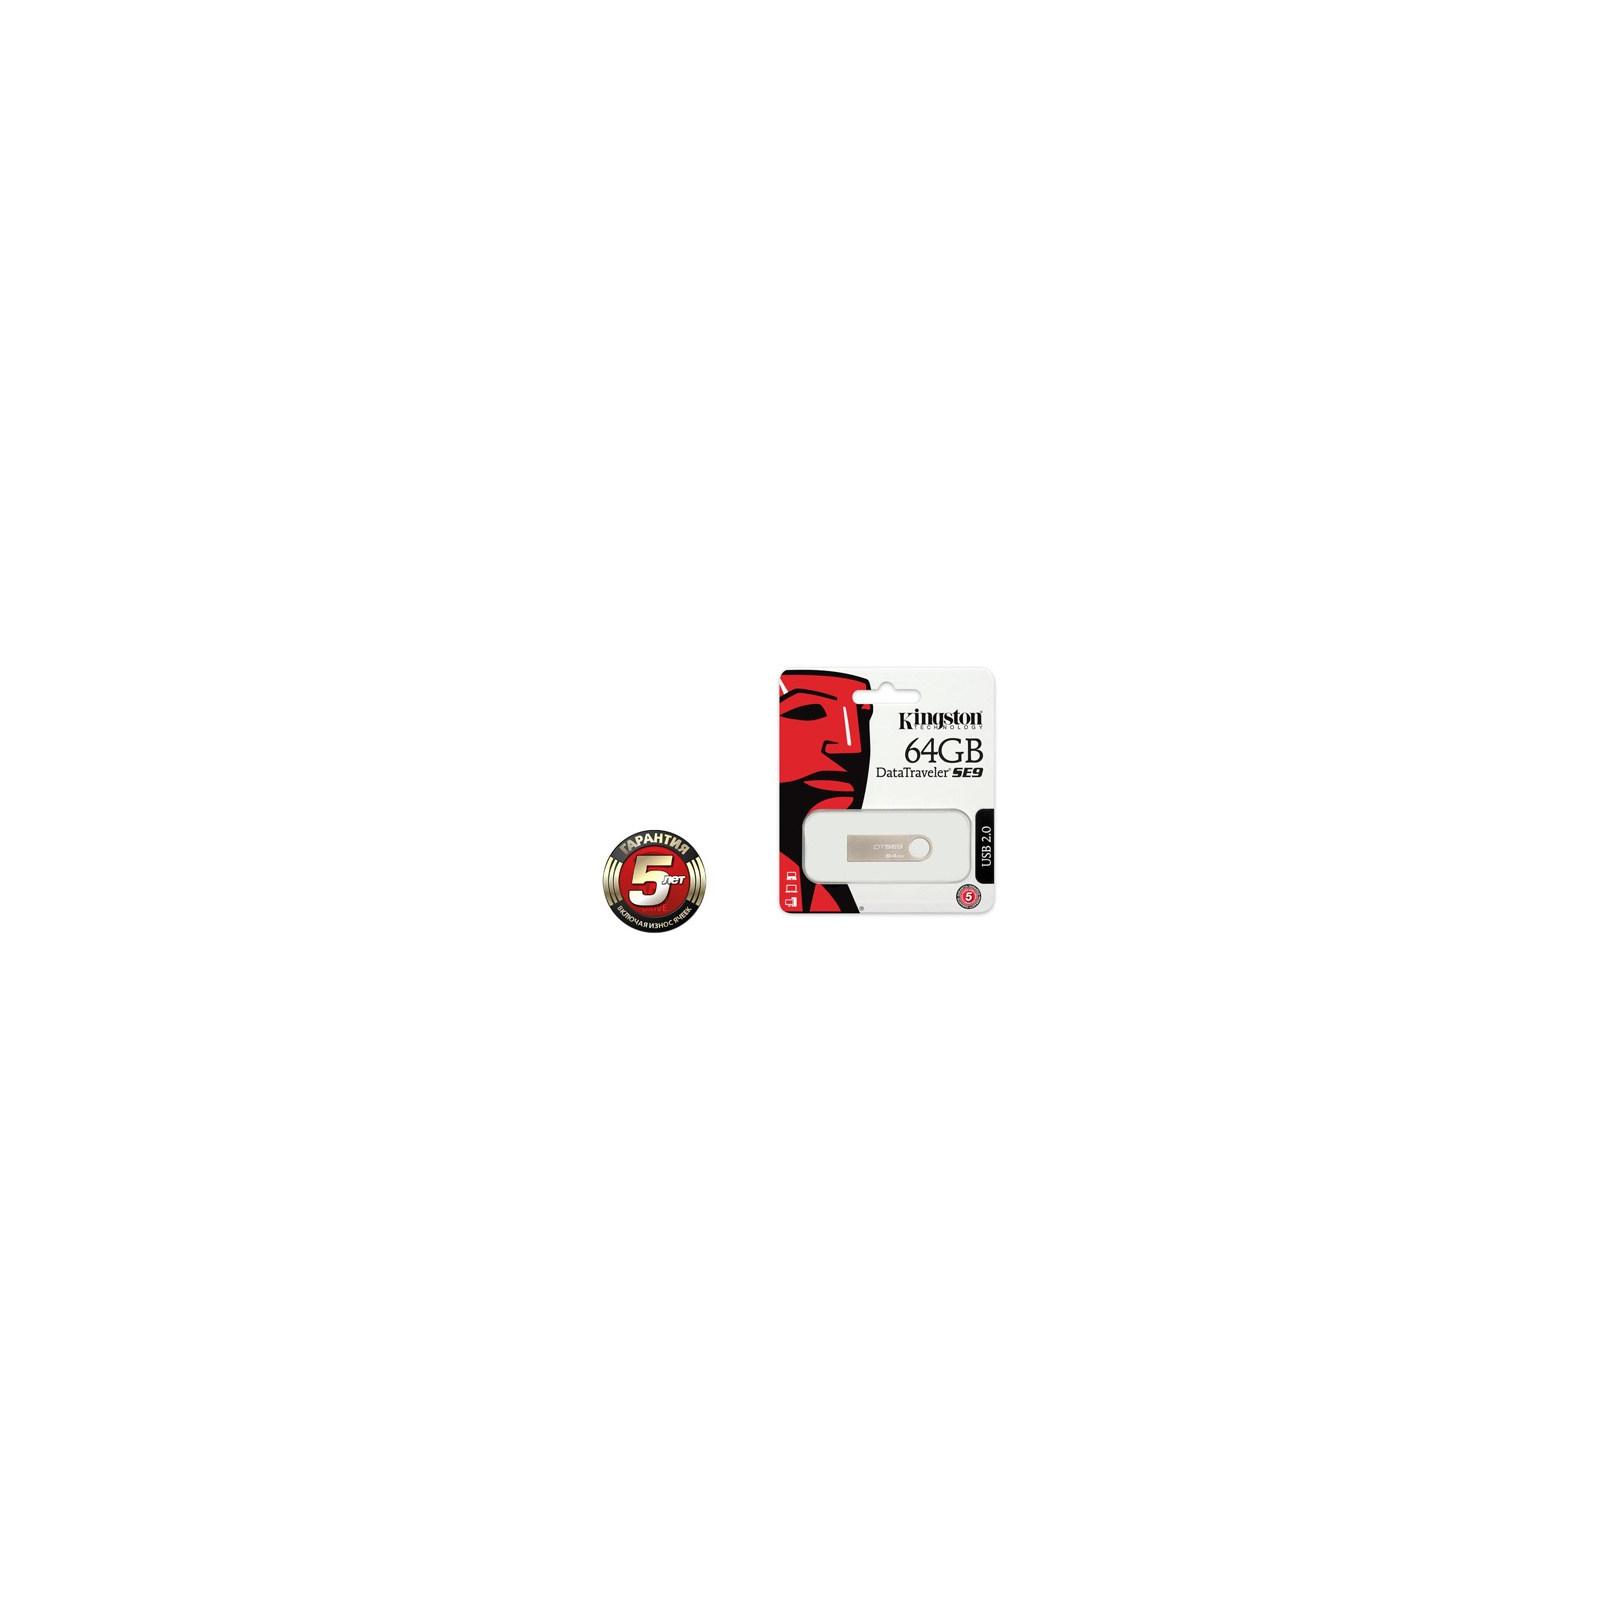 USB флеш накопитель Kingston 64Gb DataTraveler DTSE9H (DTSE9H/64GB) изображение 2